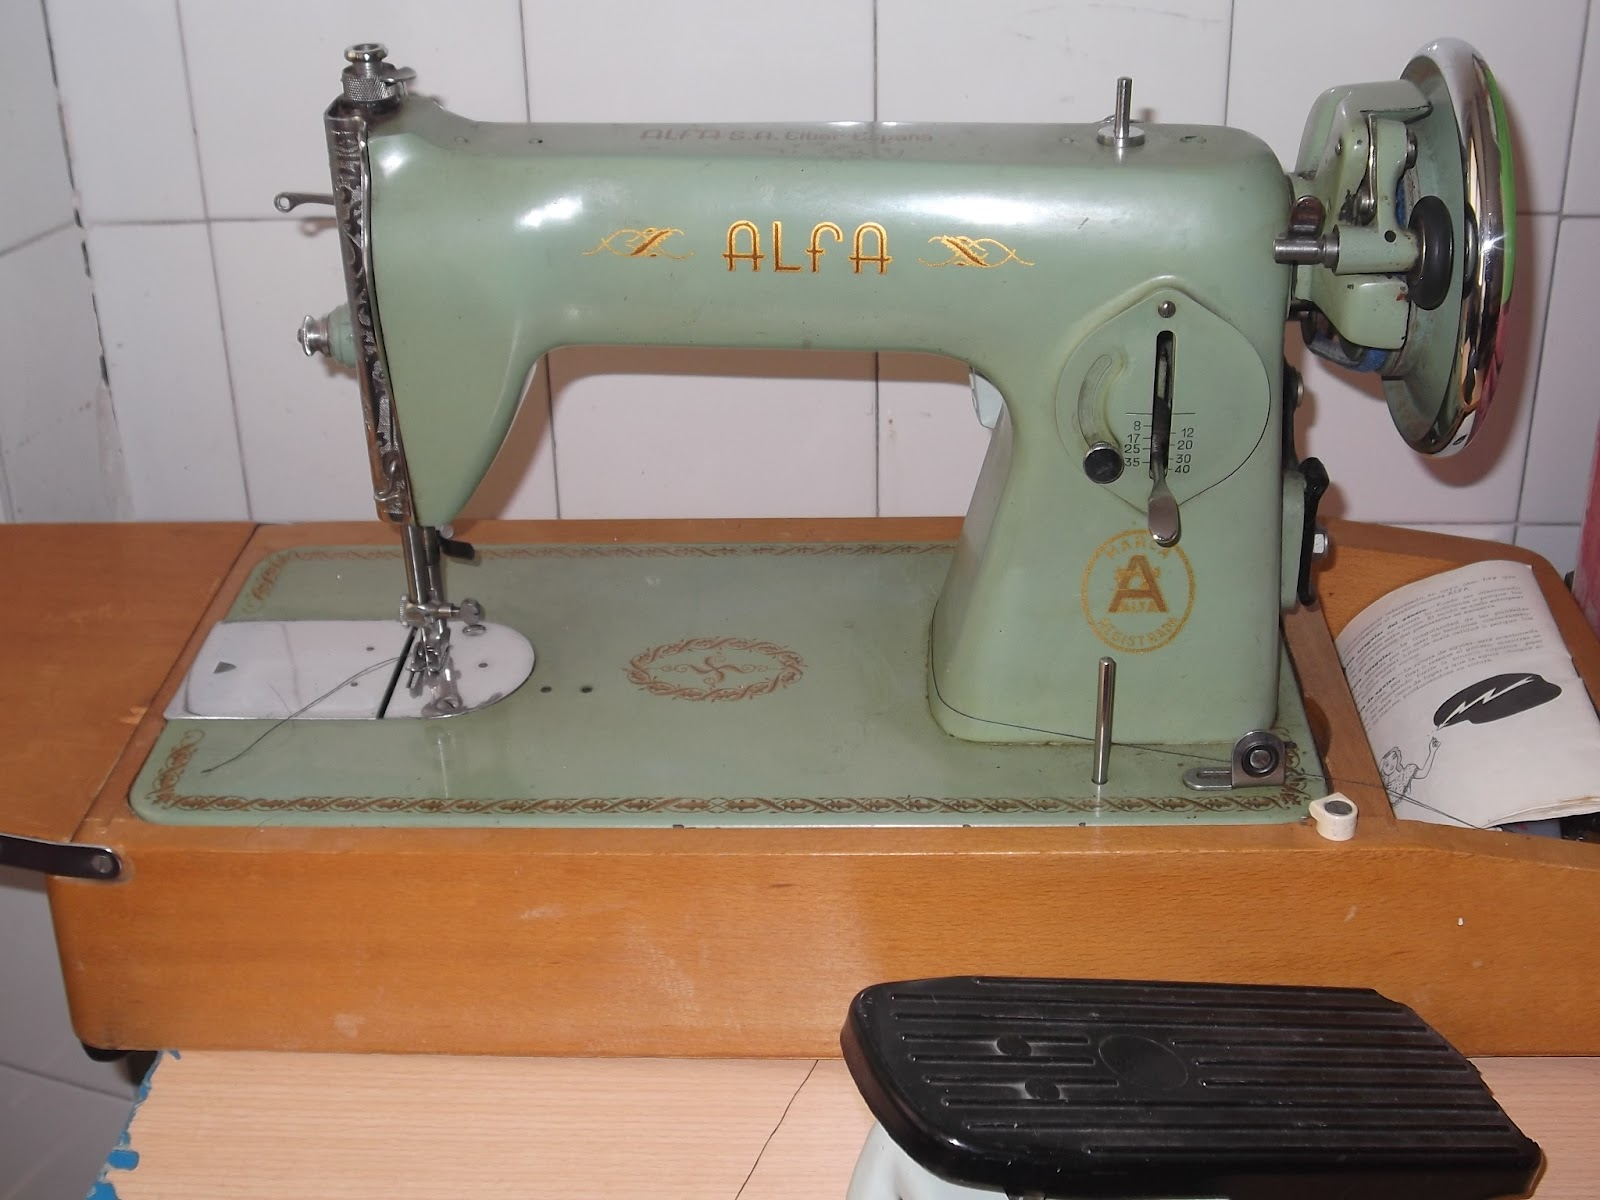 Maquina de coser buscar: Maquina de coser alfa precios